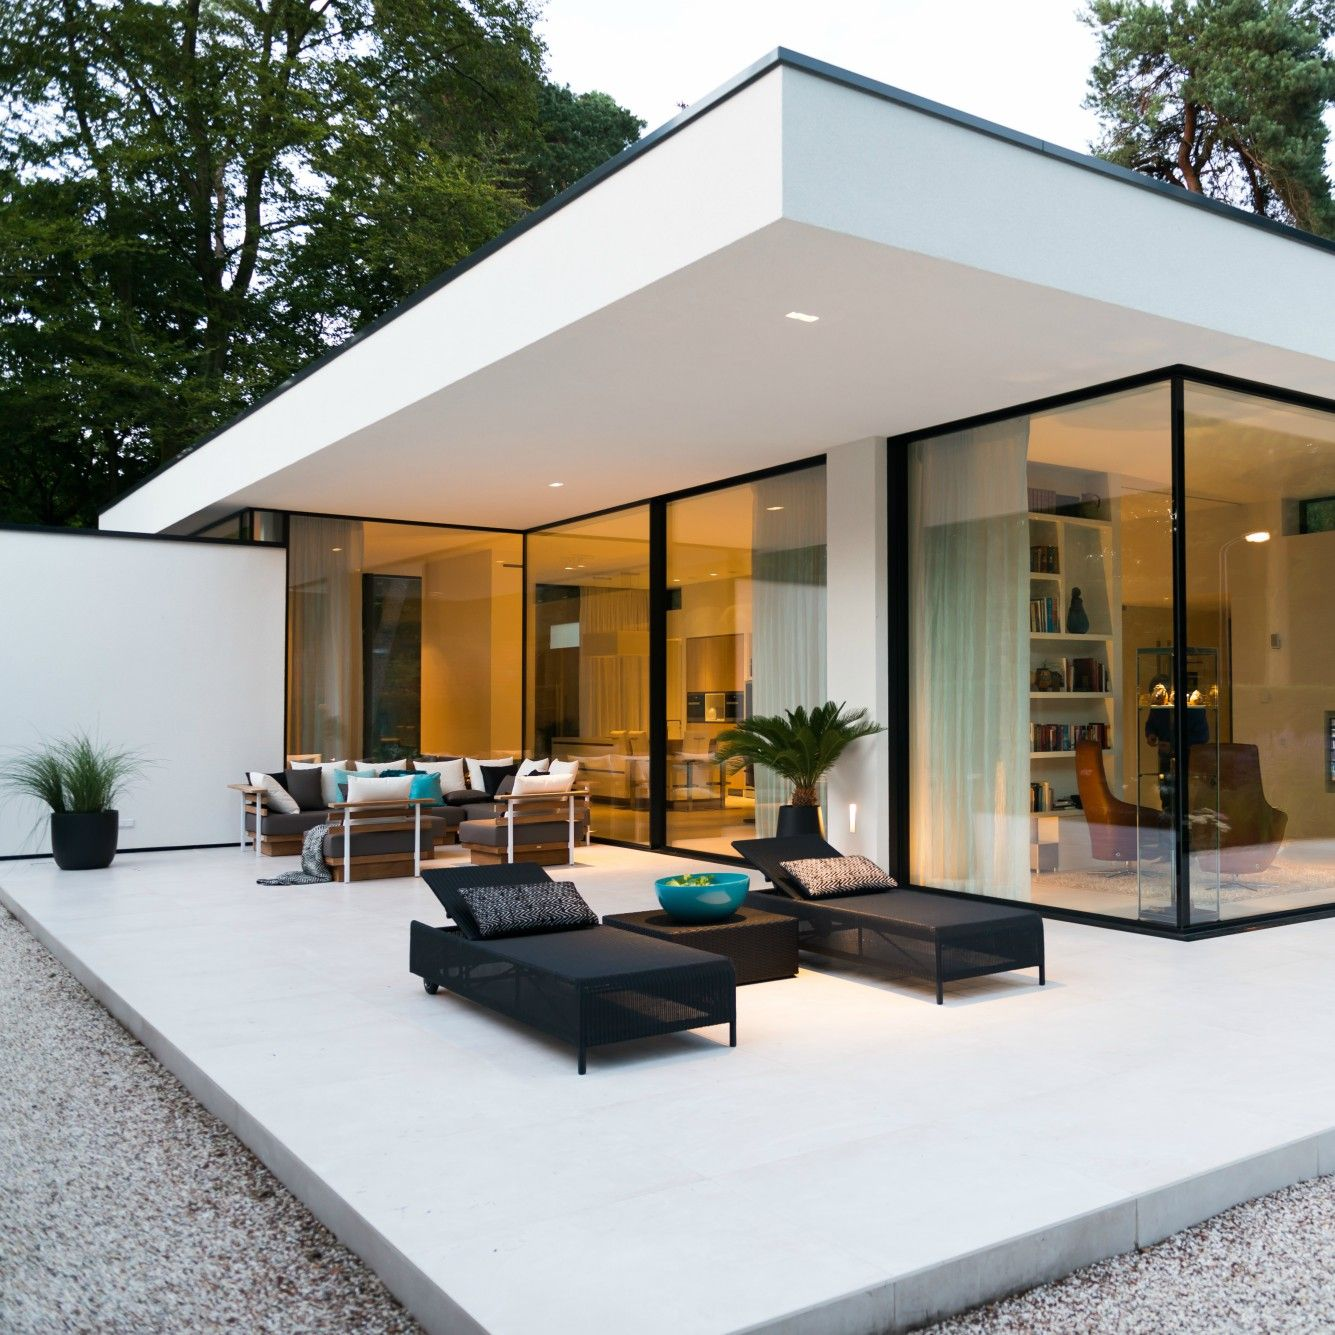 Interieur i binnenkijken i moderne bungalow in ermelo for Modernes l haus